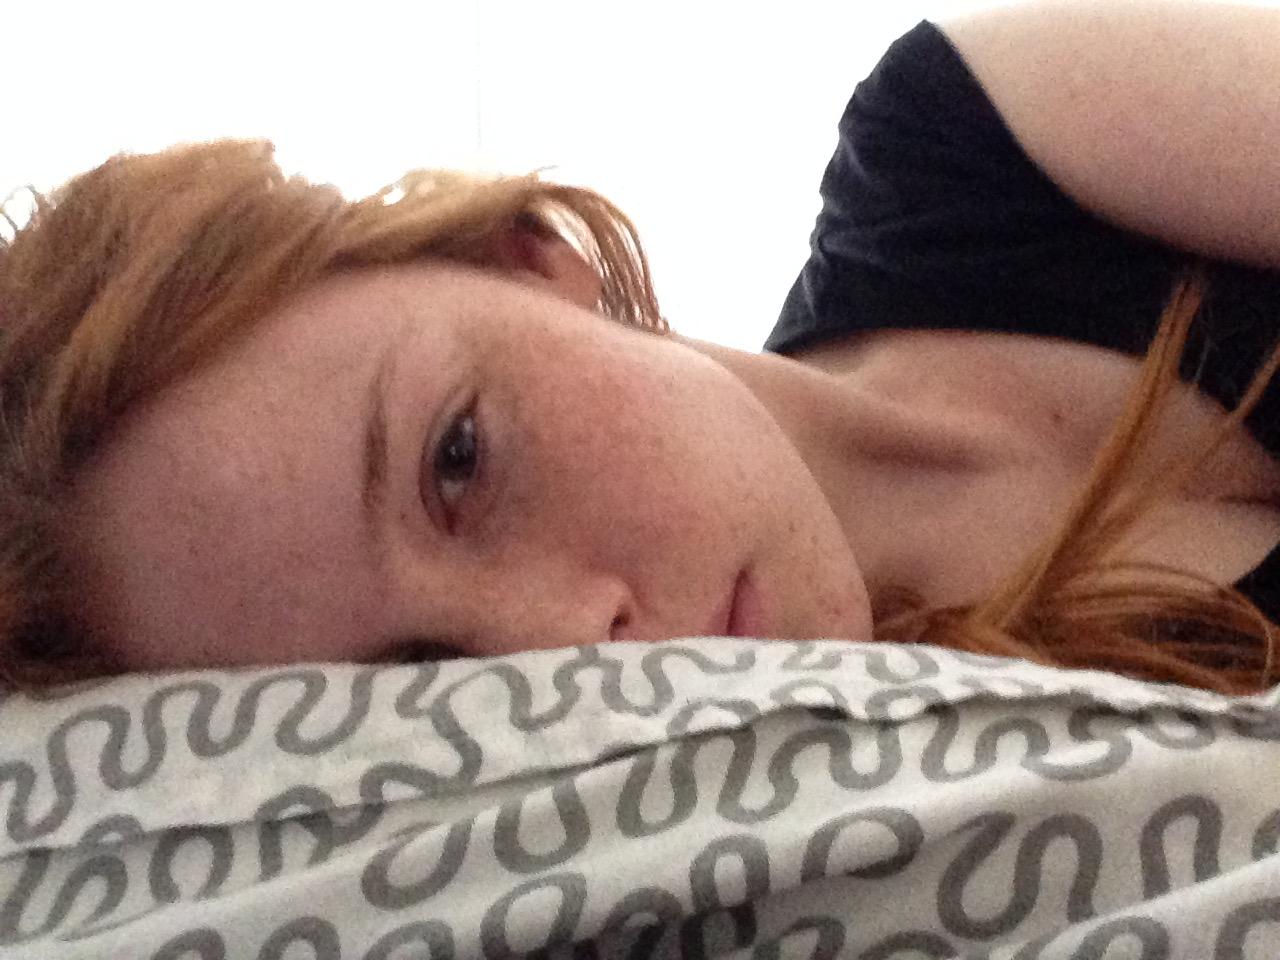 morning selfie lenka regalová redhead freackles